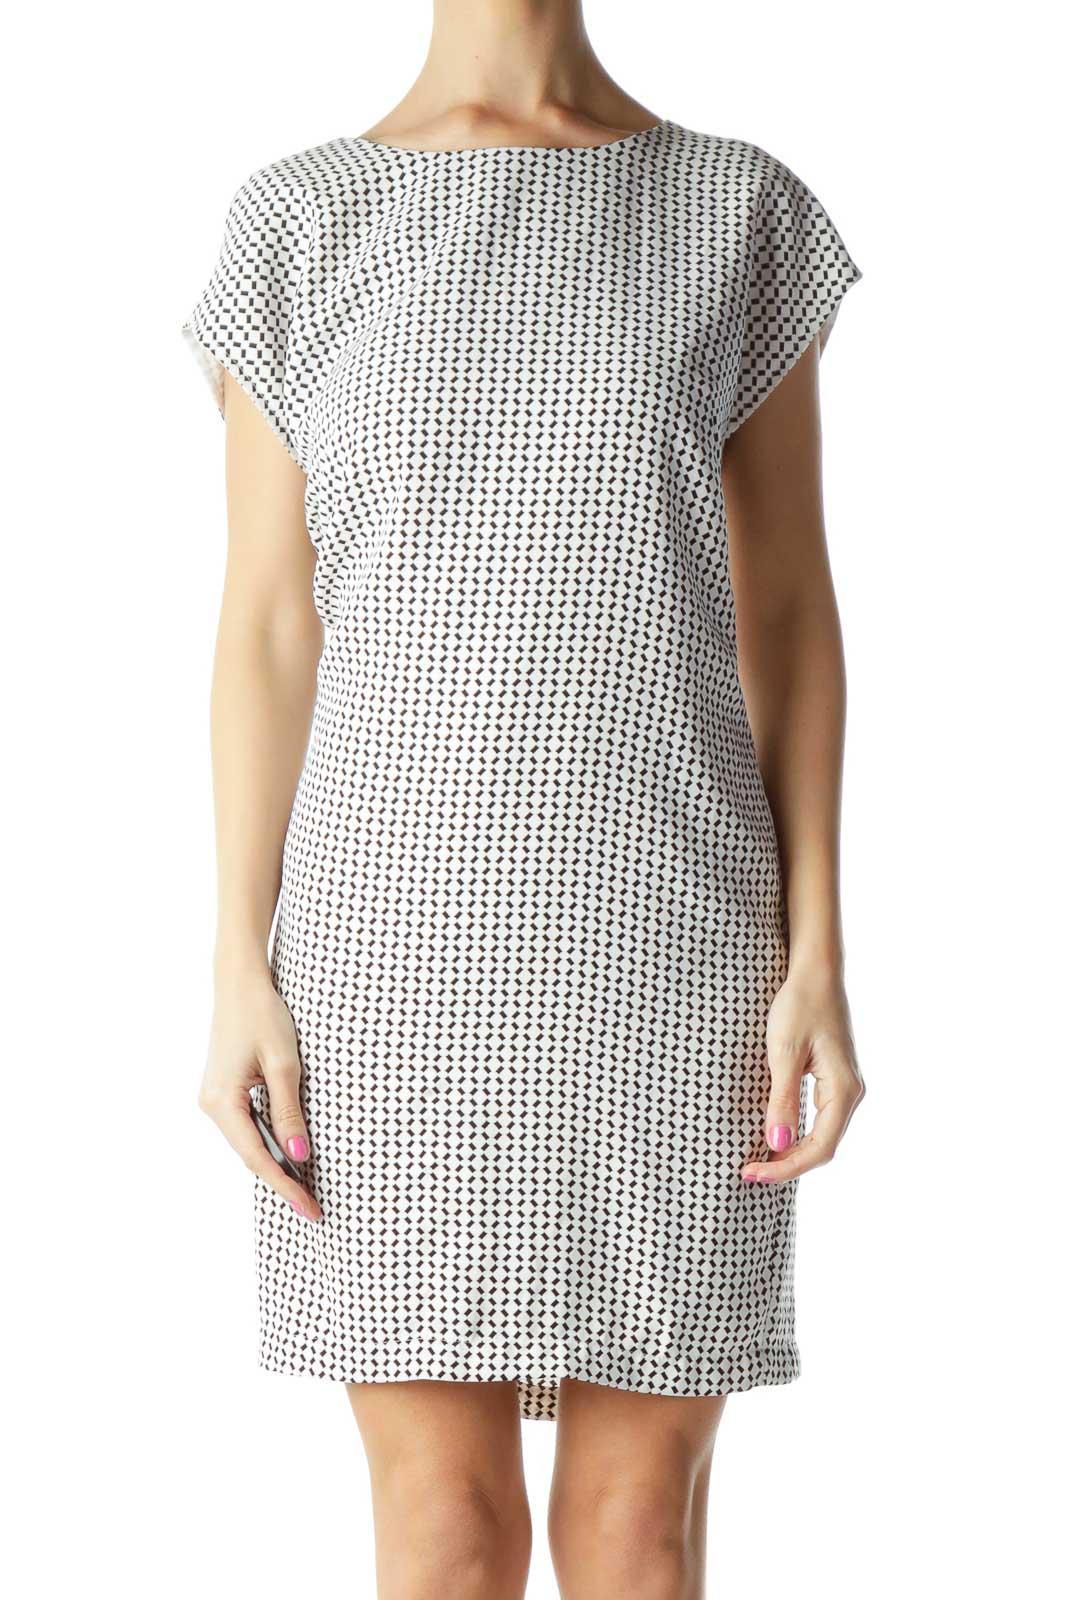 White Black Printed Shift Dress Front